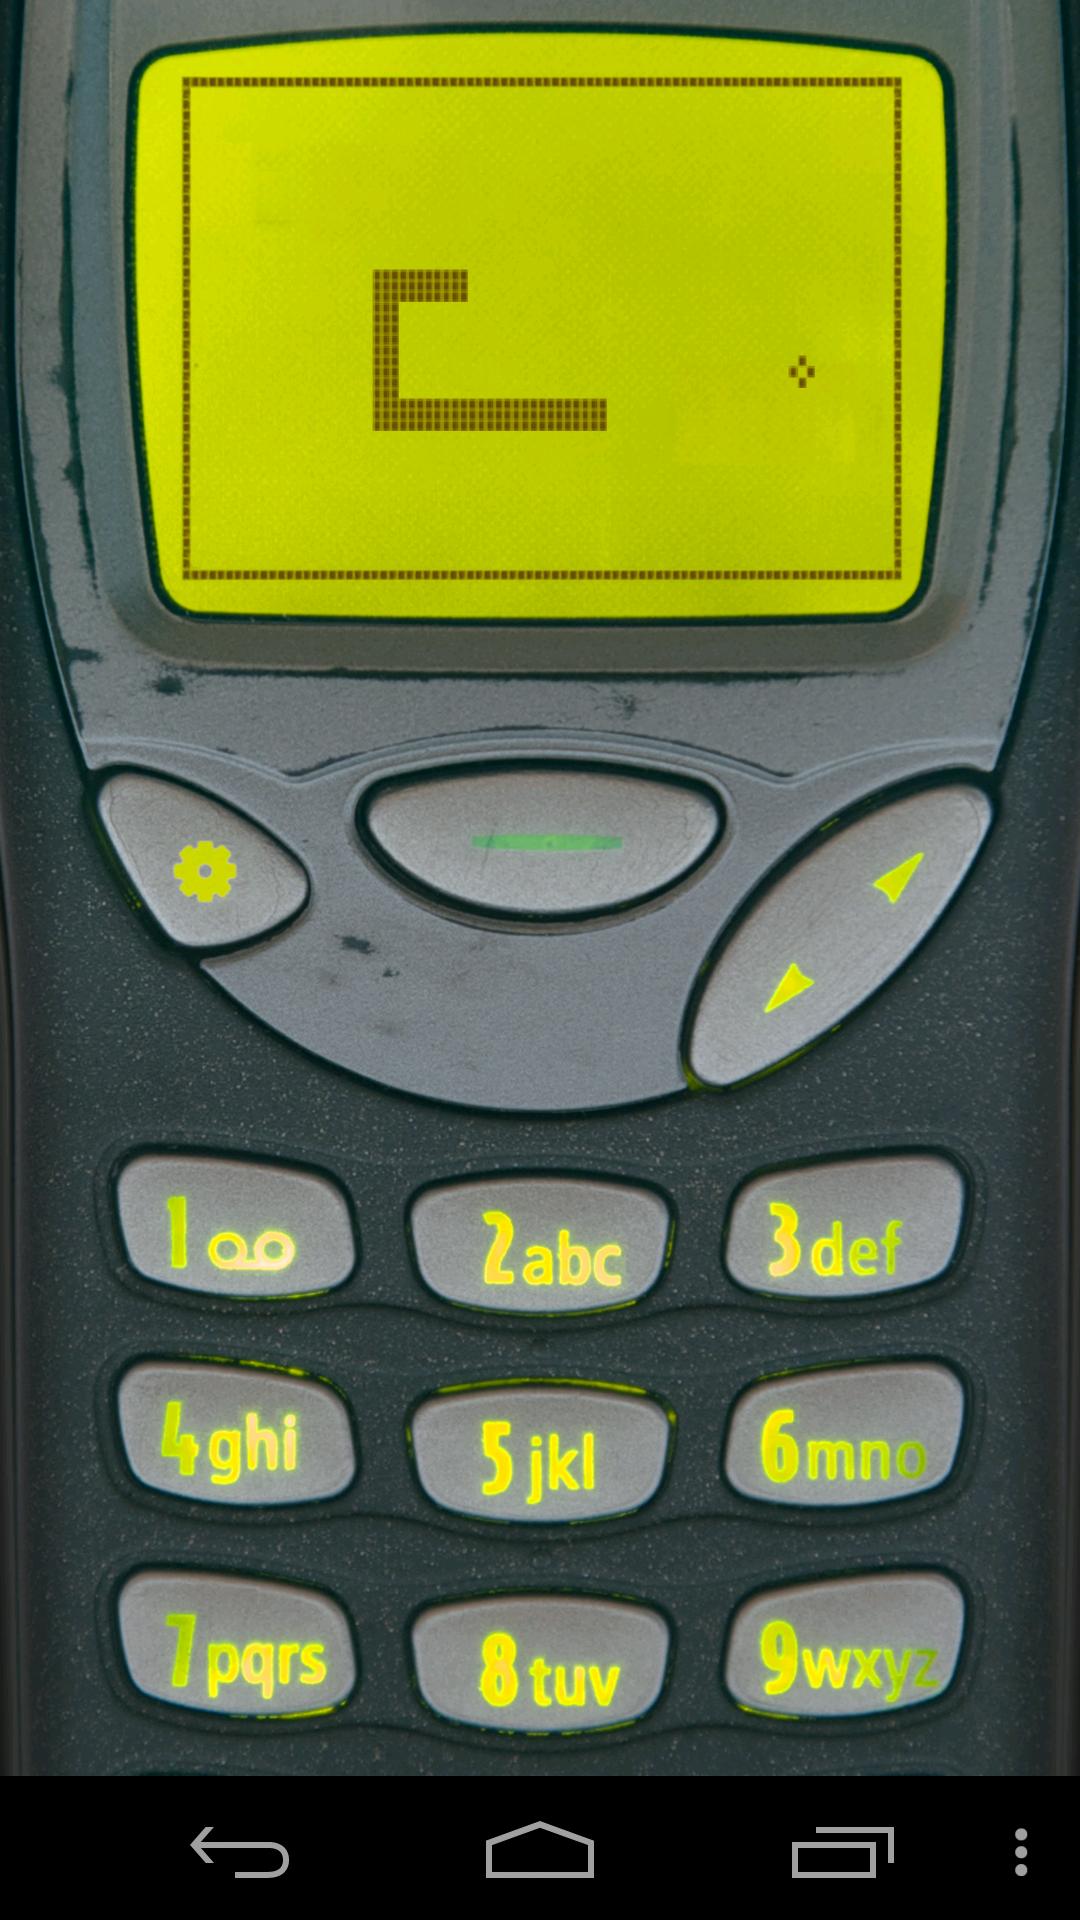 Snake '97: retro phone classic: Amazon.co.uk: Appstore for ...